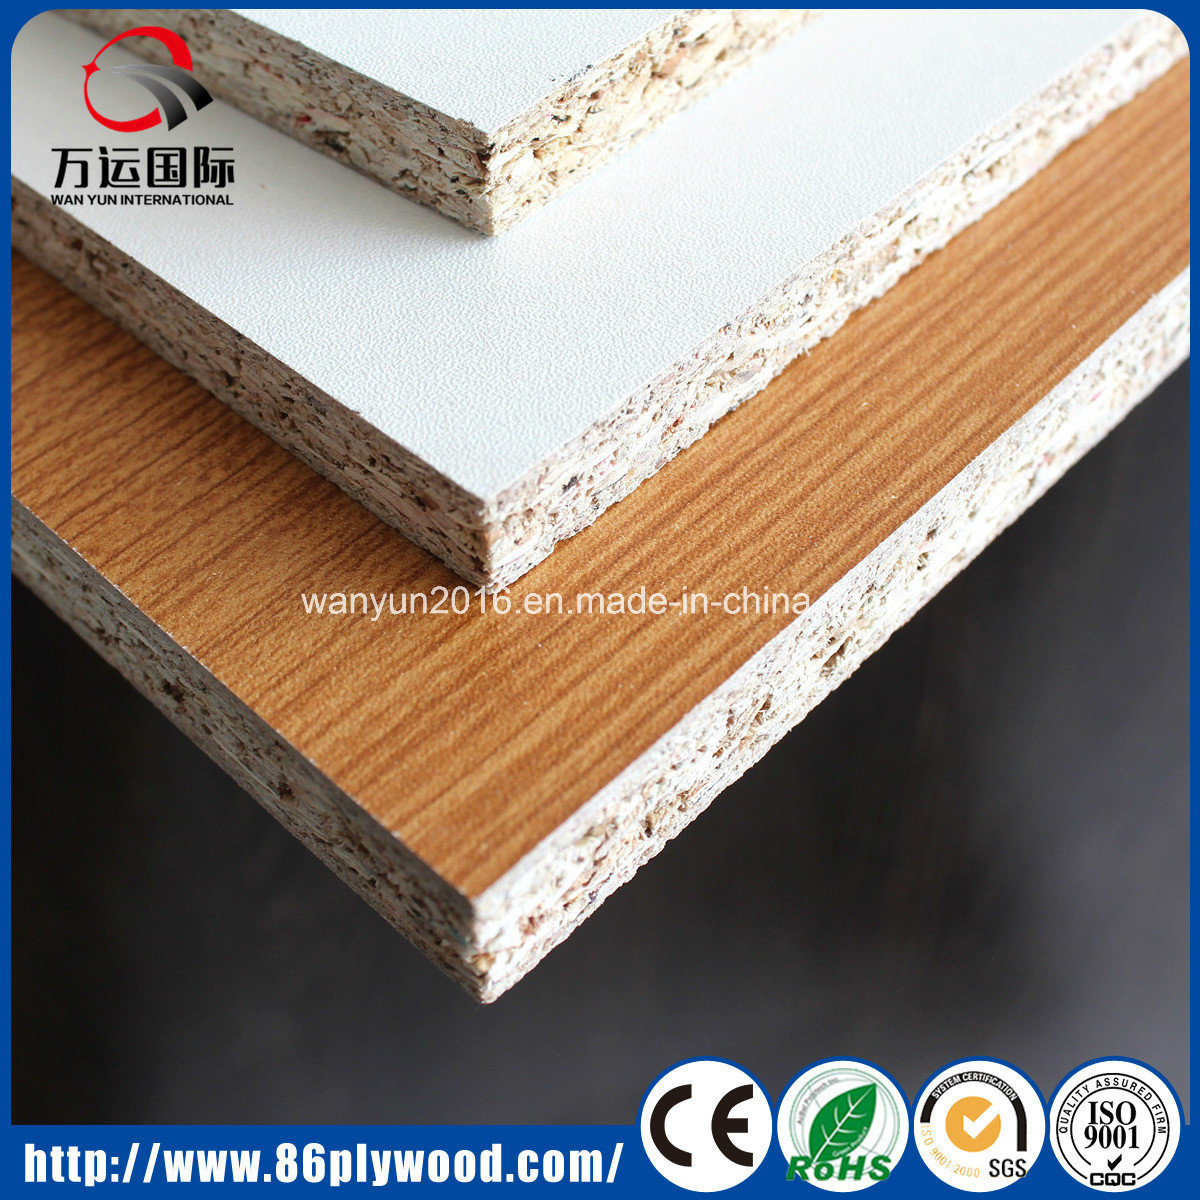 18mm E2 Glue Plain/ Melamine Particle Board